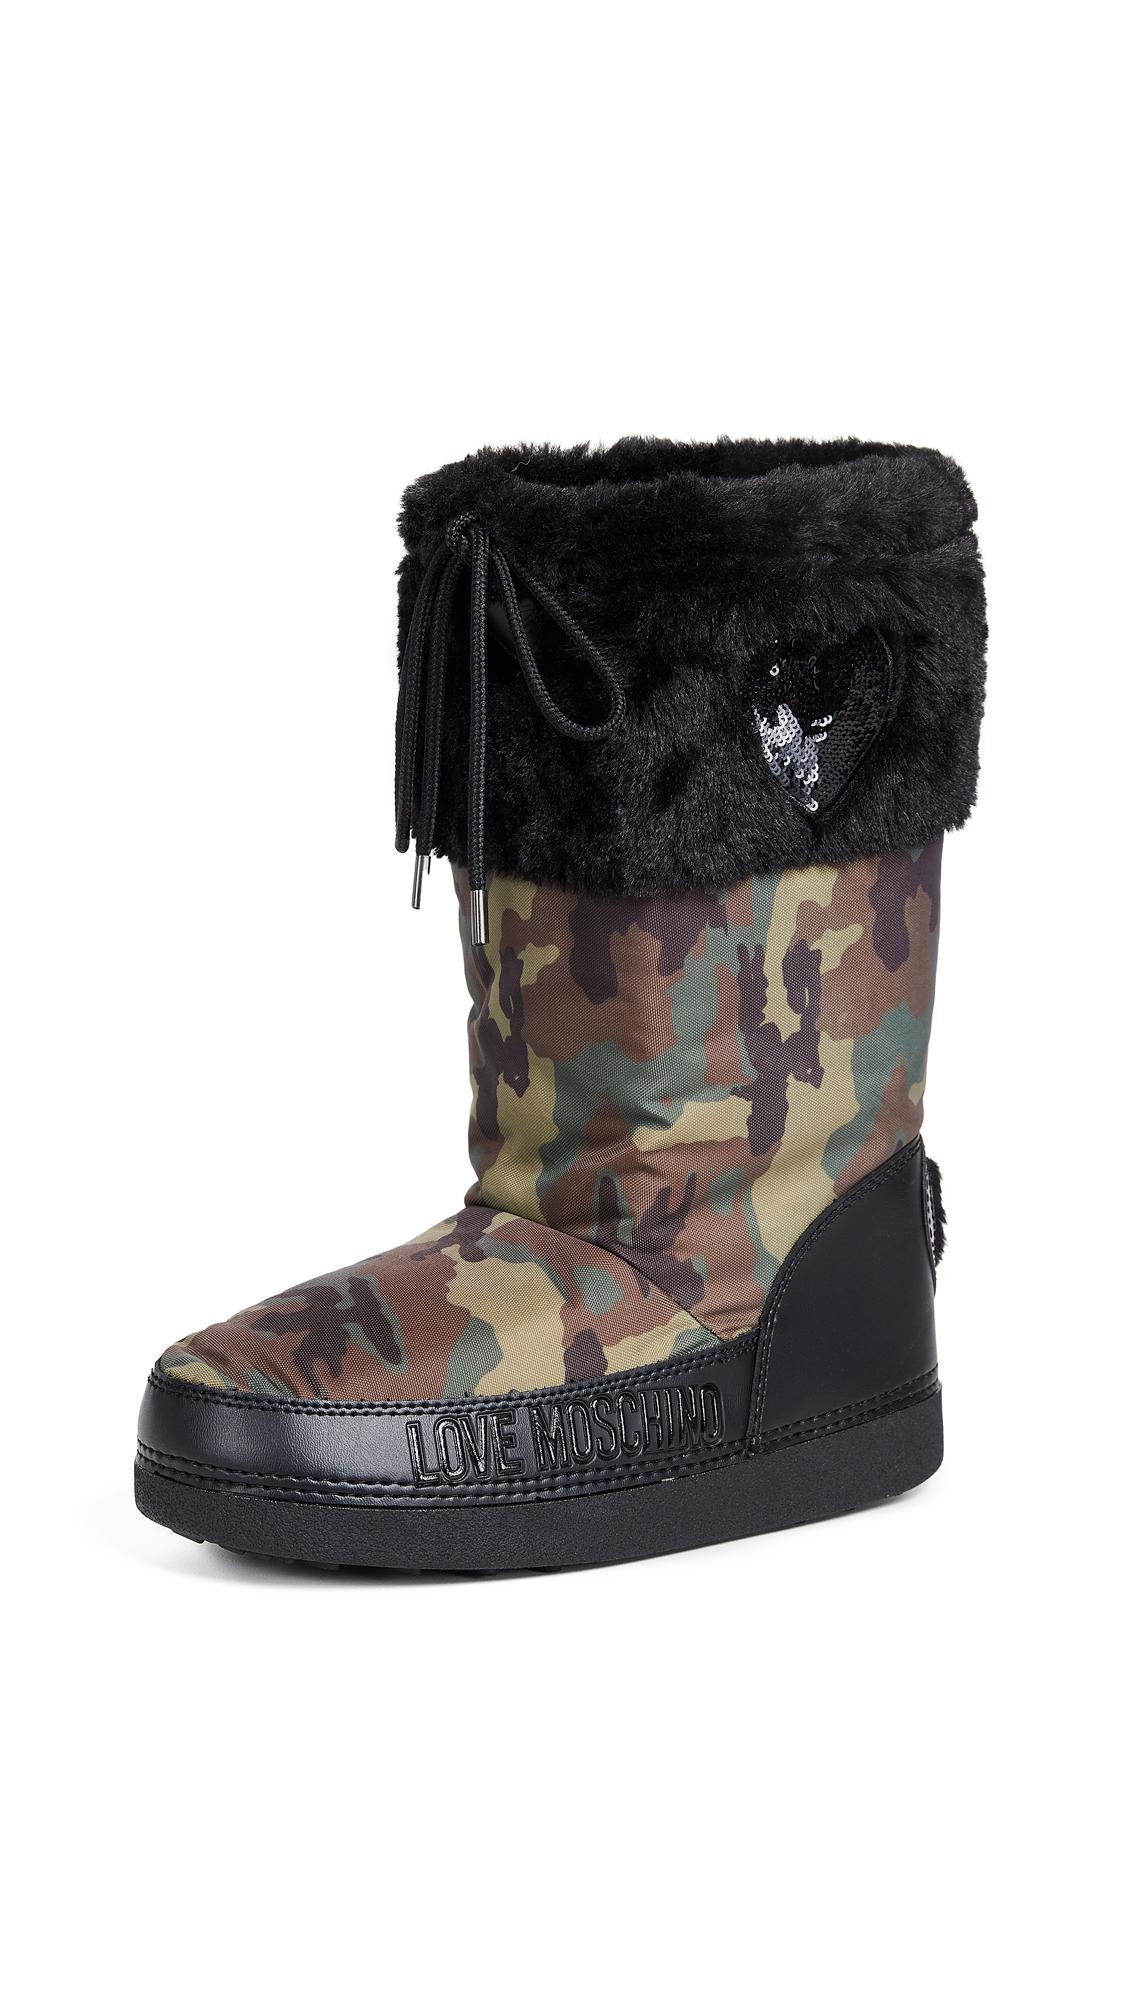 Moschino Love Moschino Snow Boots - Camo